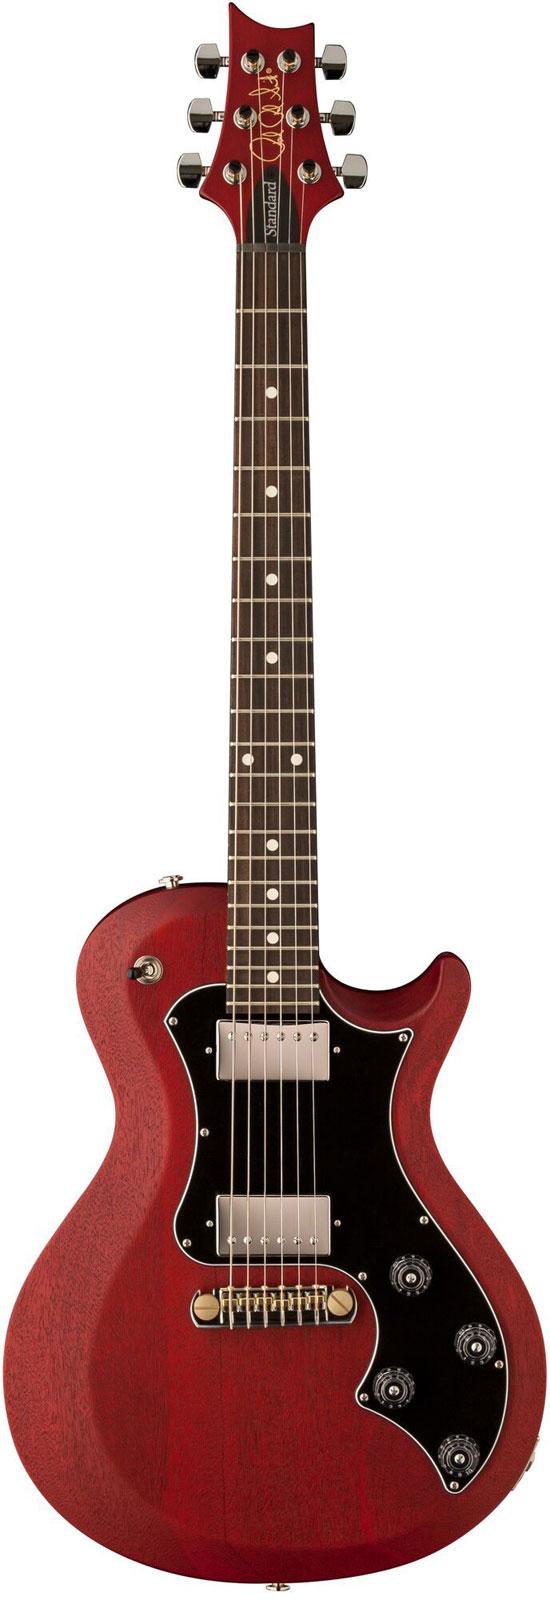 Prs - Paul Reed Smith S2 Singlecut Standard Satin Vintage Cherry